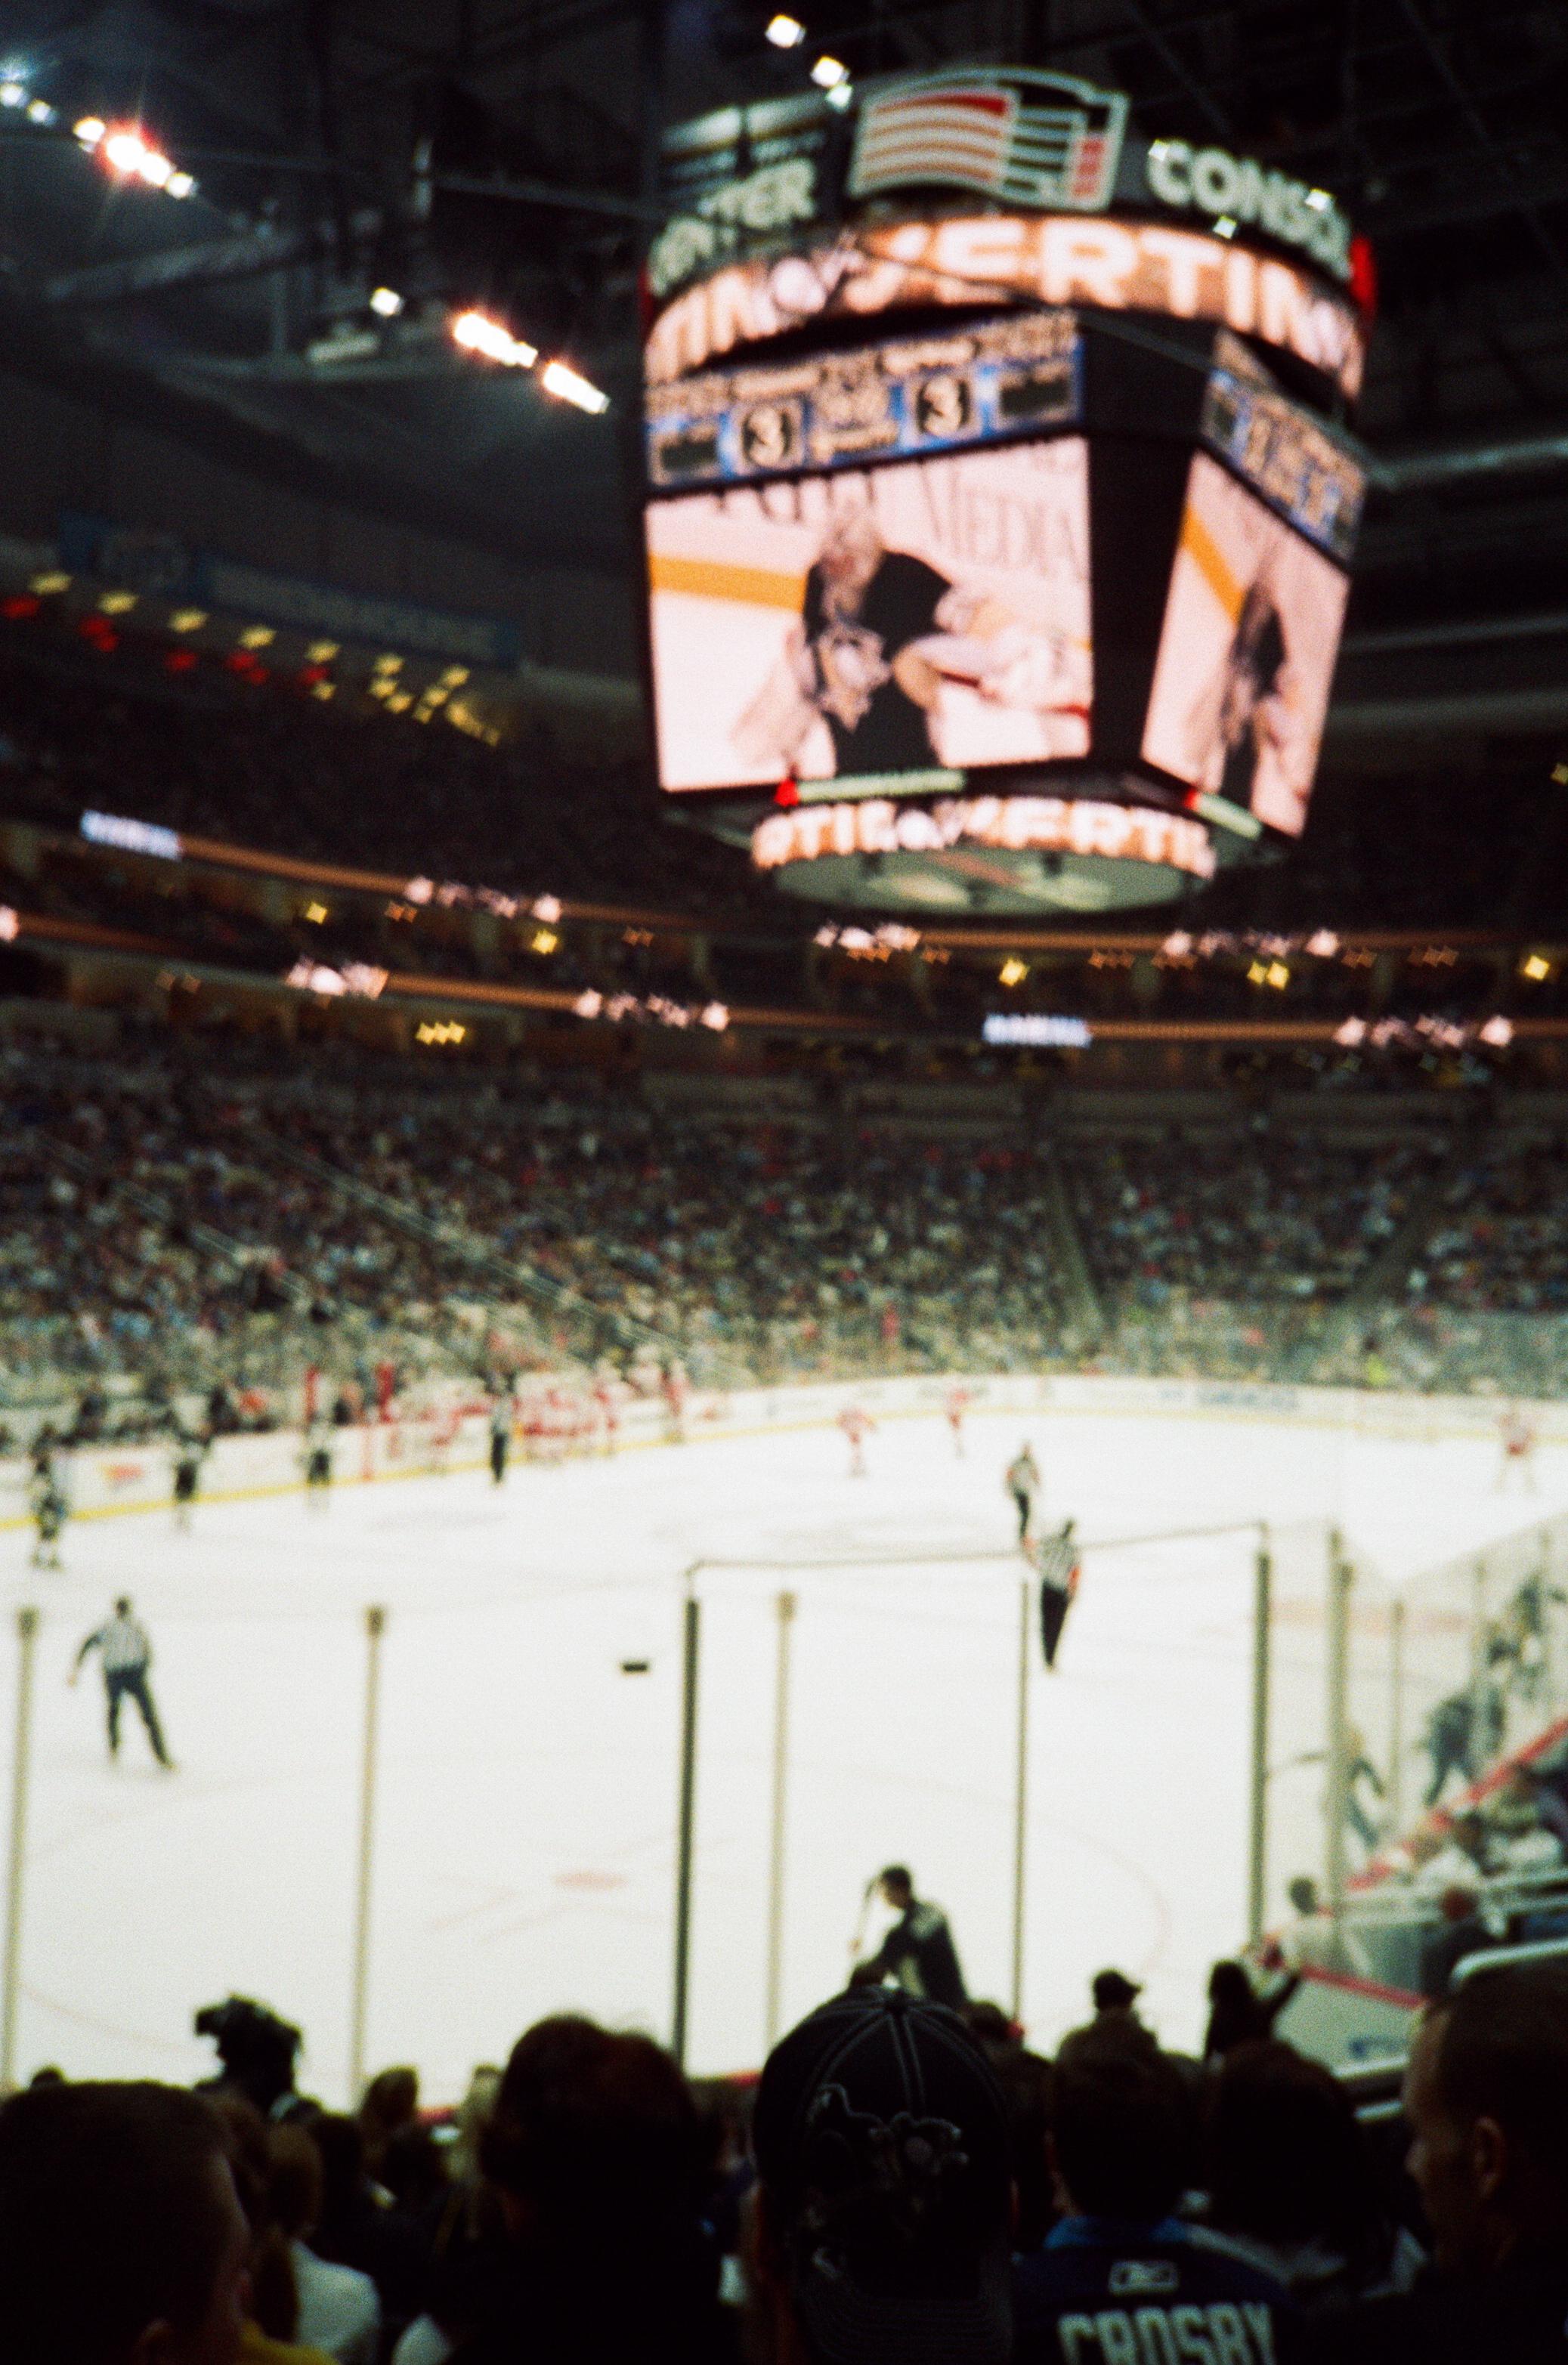 Hockey-Night-In-Pittsburgh-Film-Photography-Karlsson-057.jpg